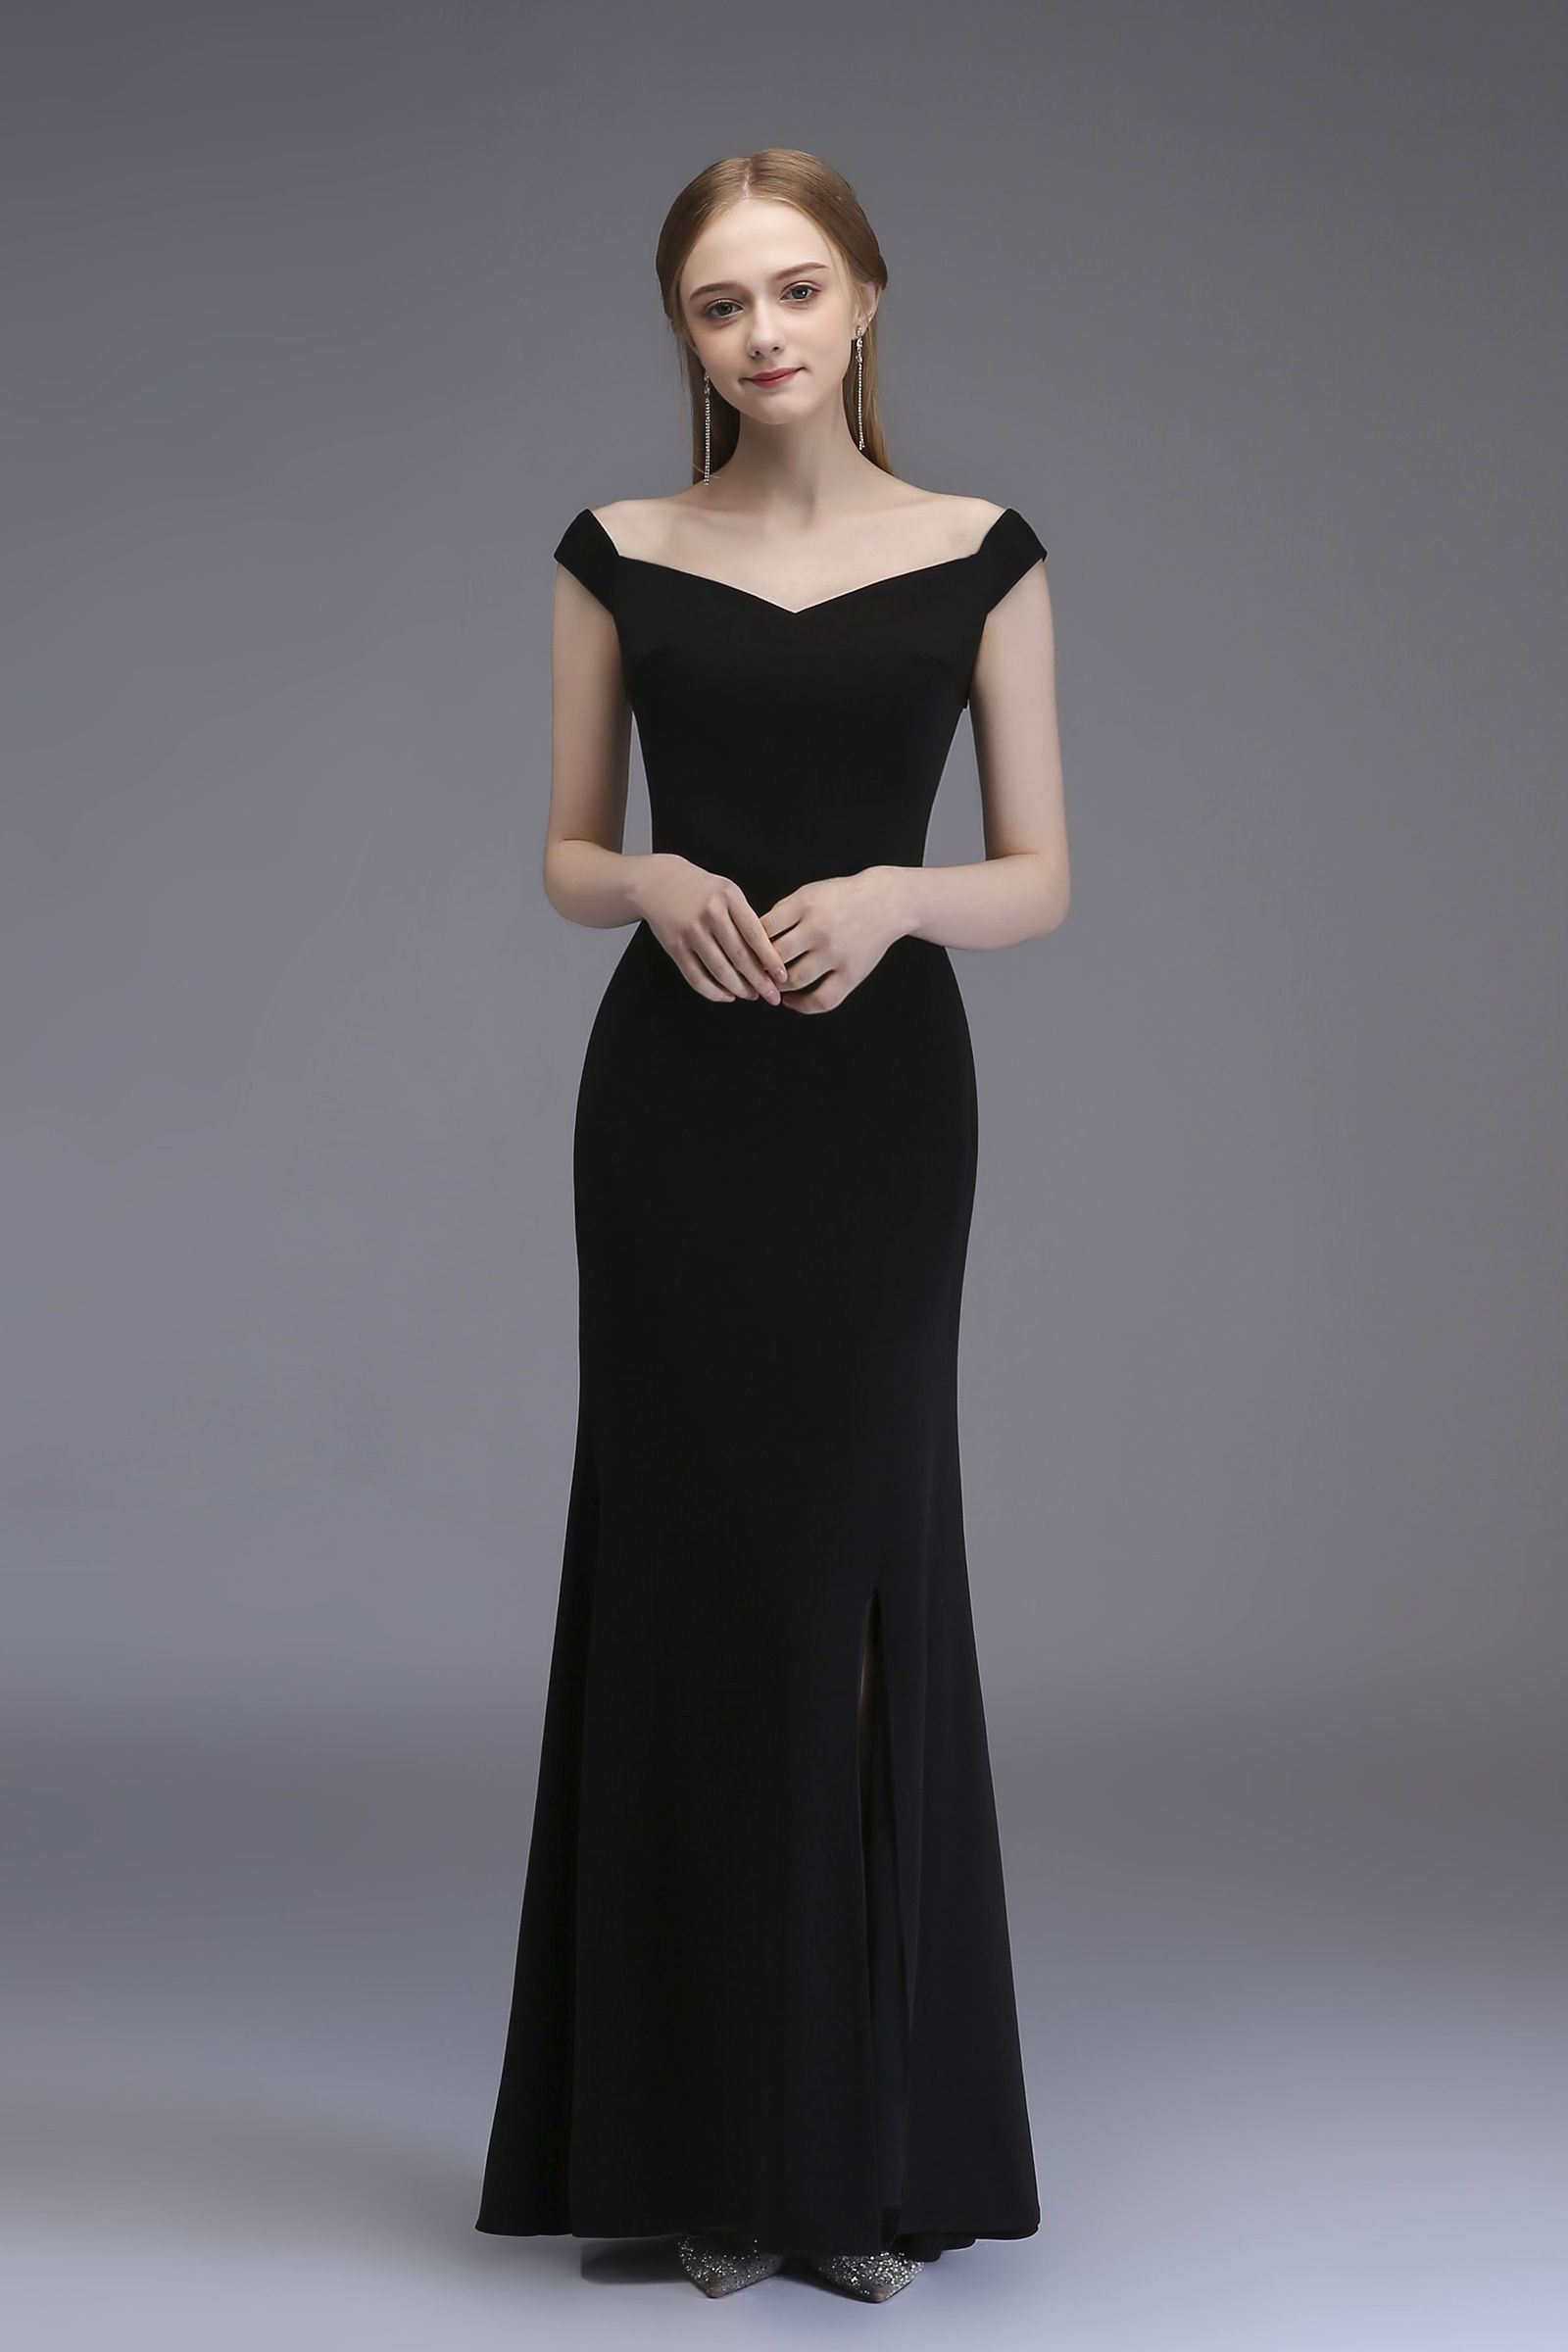 Black Long Prom Dress